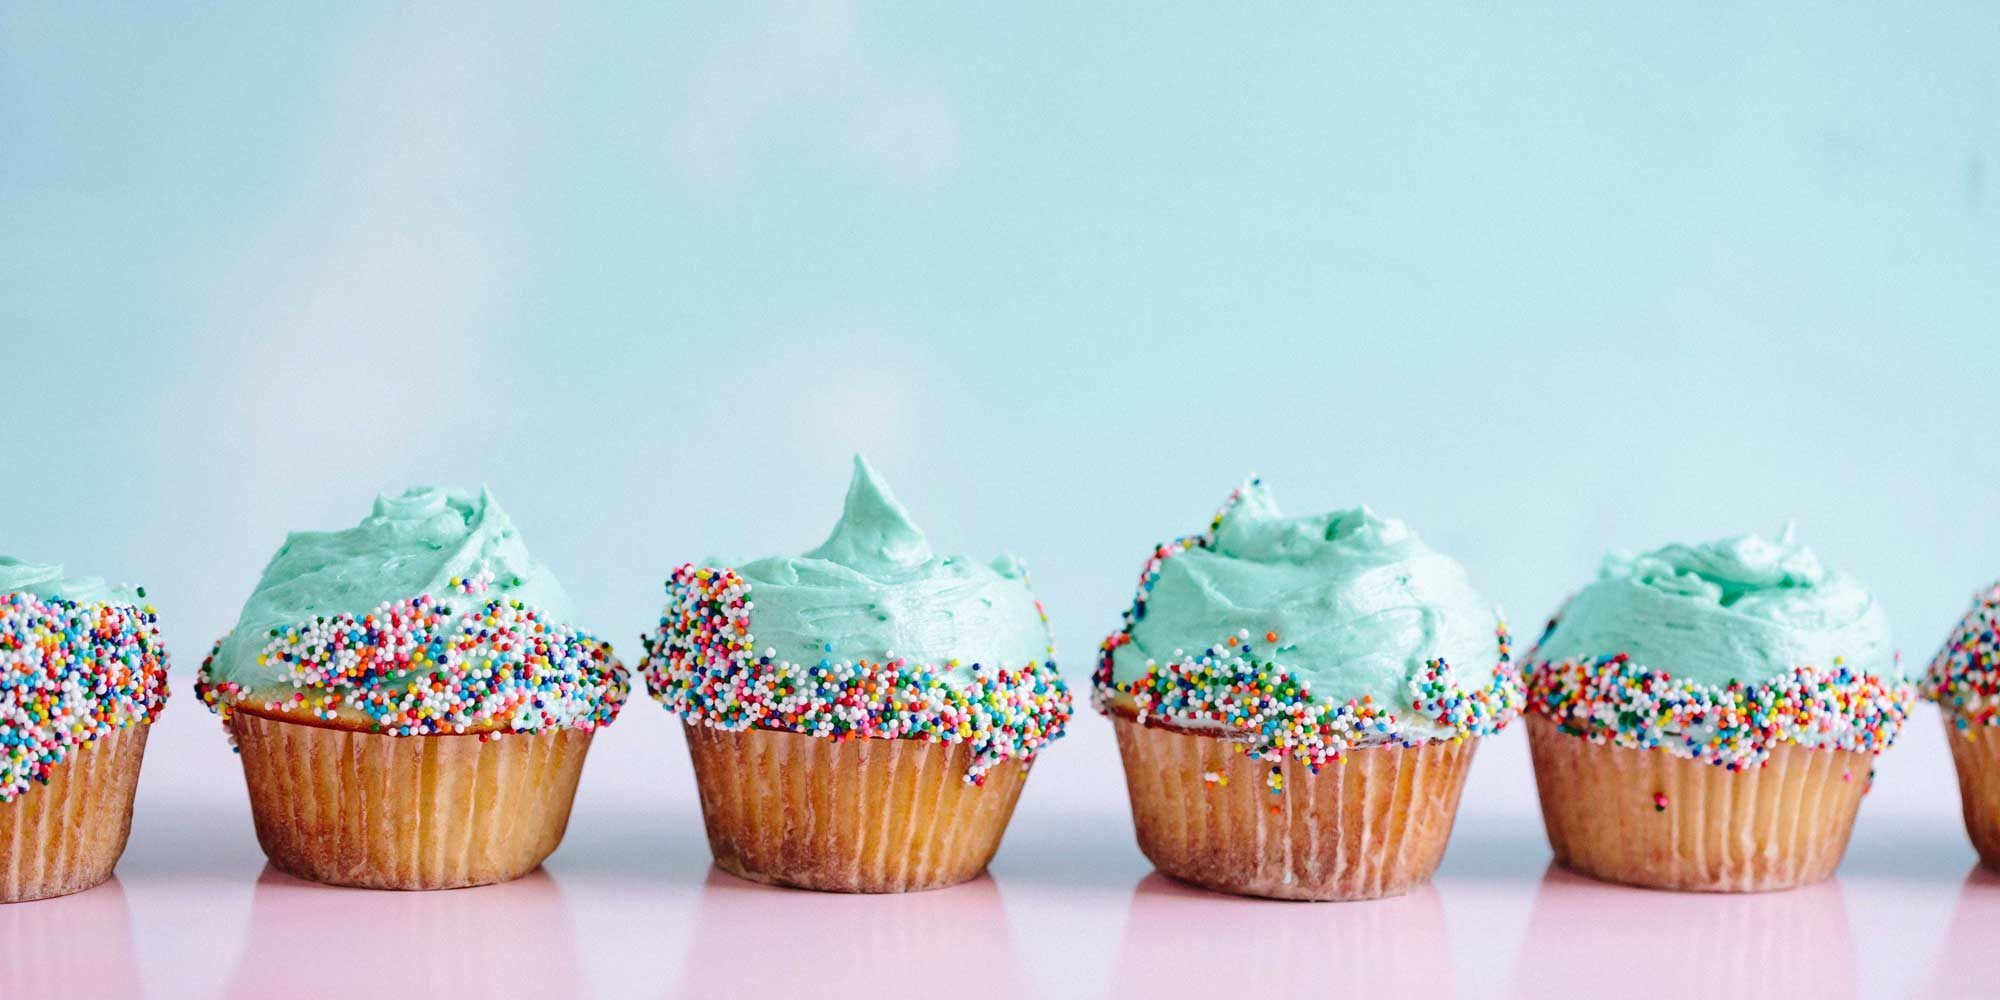 Happy Birthday to you - Schokolade im Schuh!